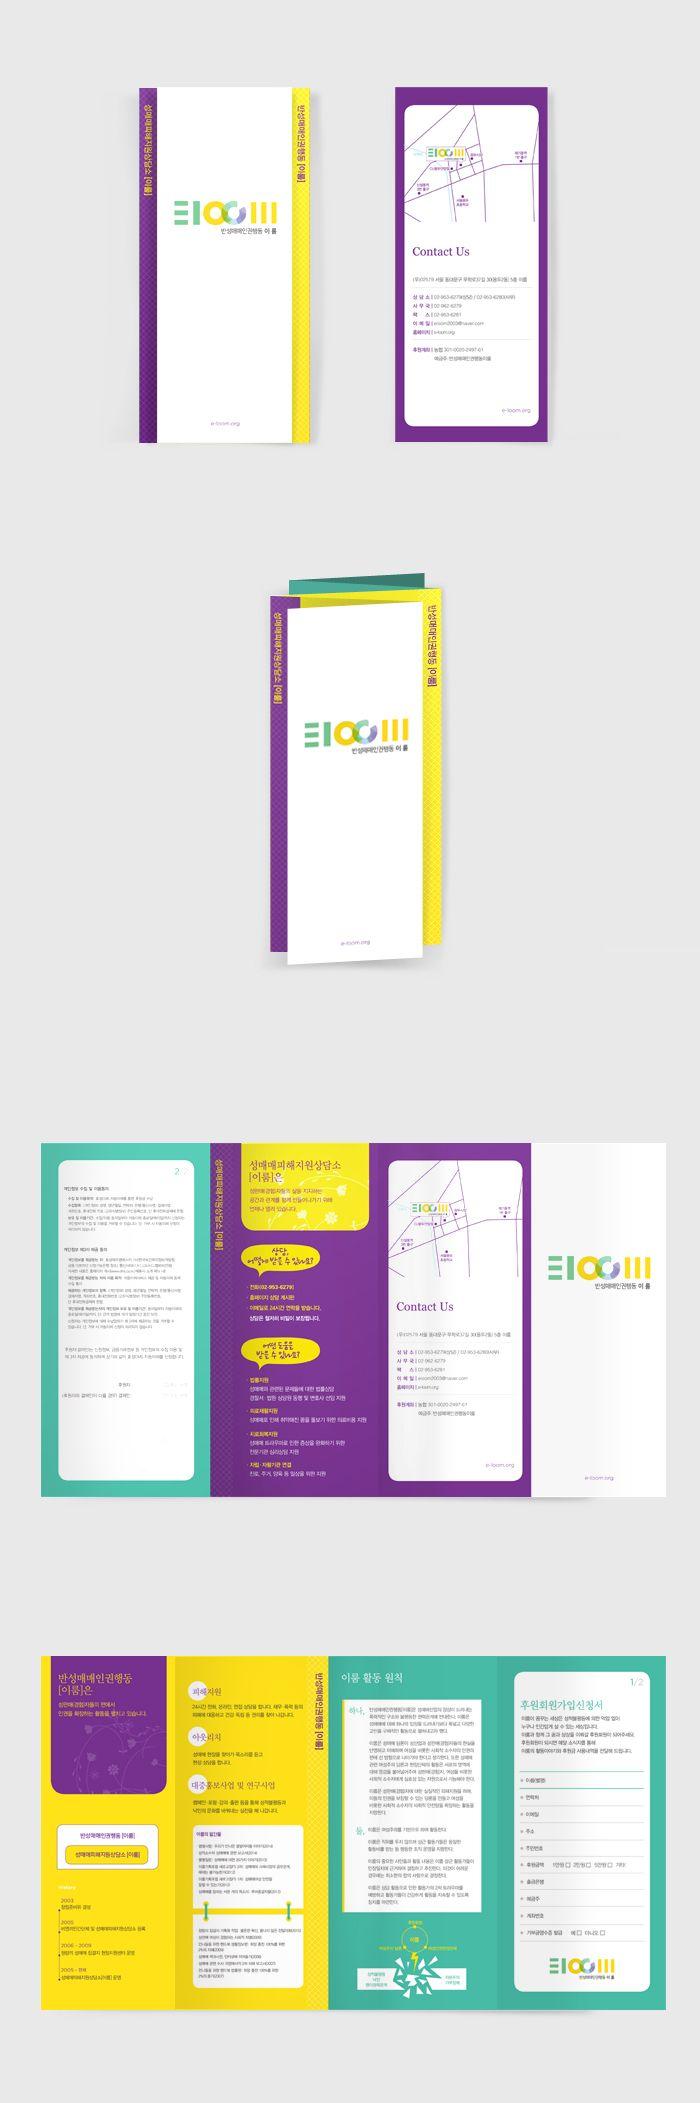 client: eloom | leaflet | 370x210mm | Accordian Fold | | Perforation | Spot UV Varnish